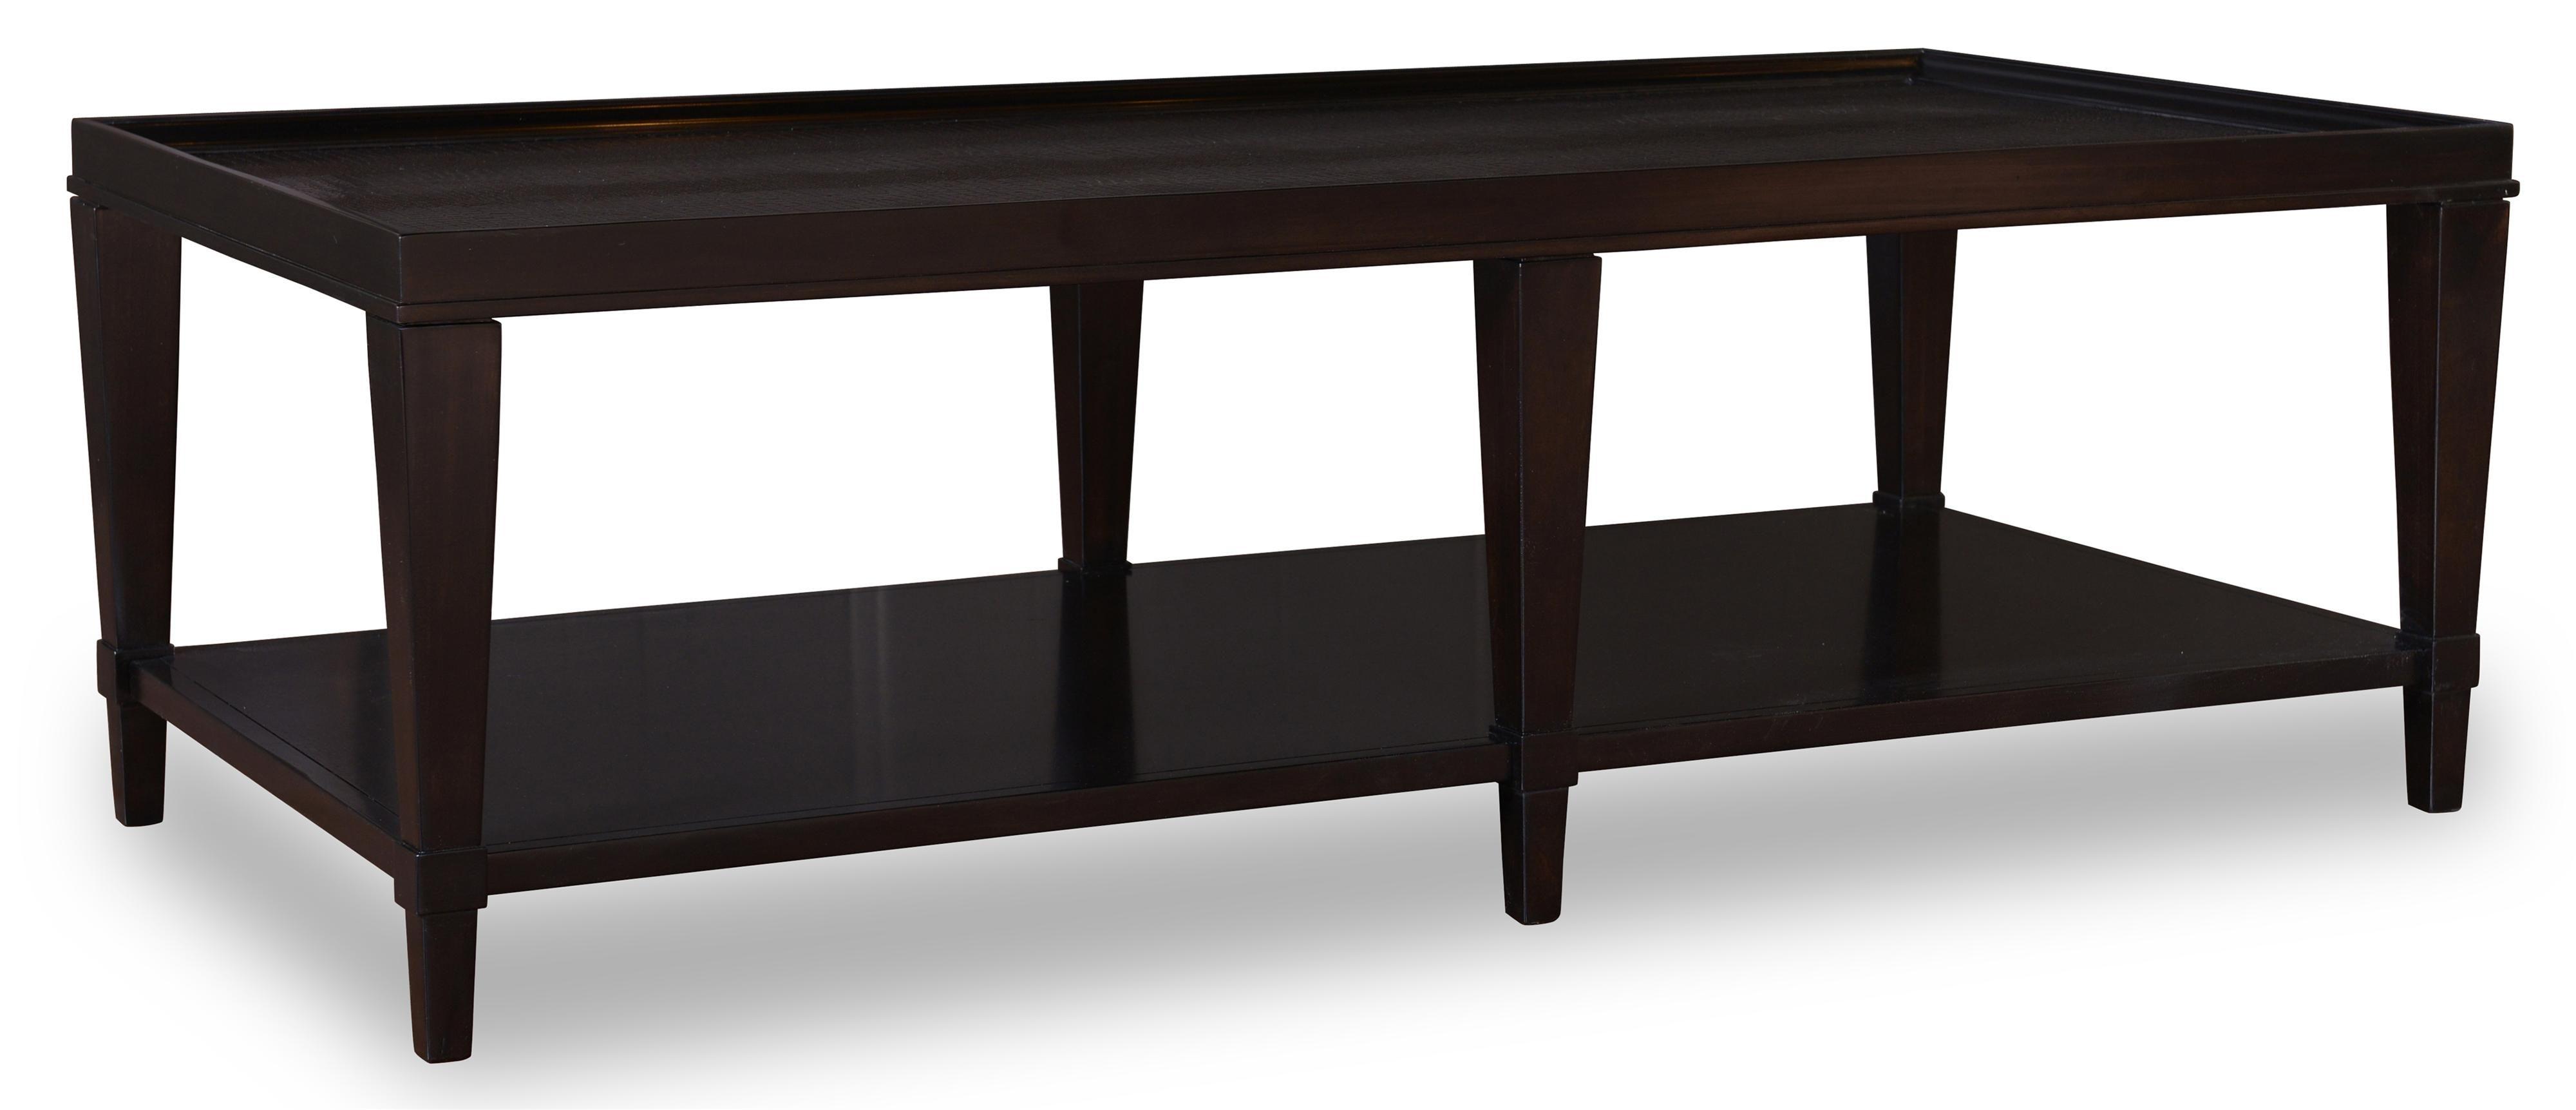 cosmopolitan rectangular cocktail table